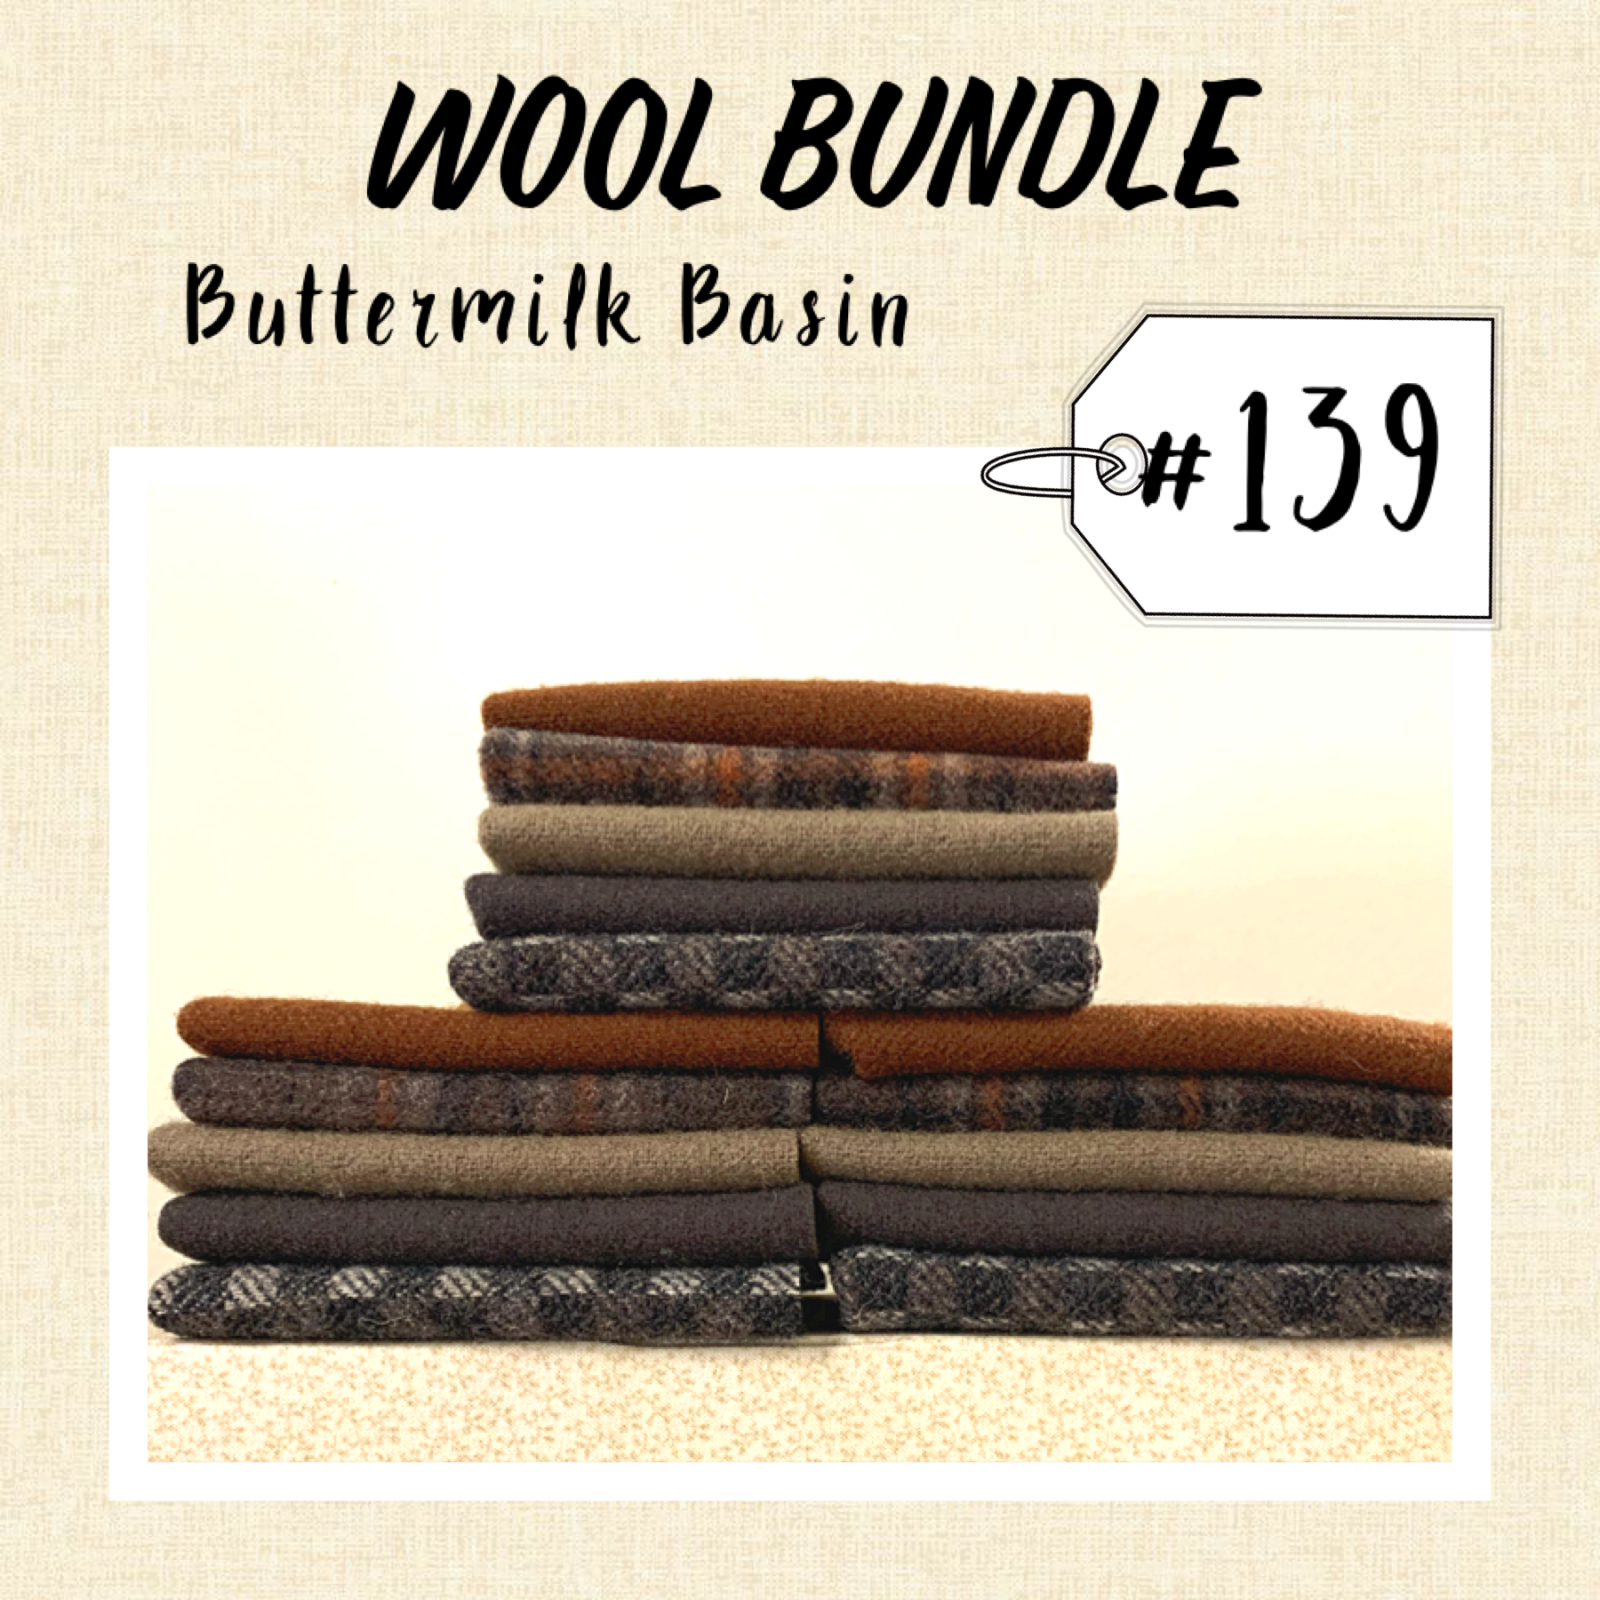 Wool Bundle #139B